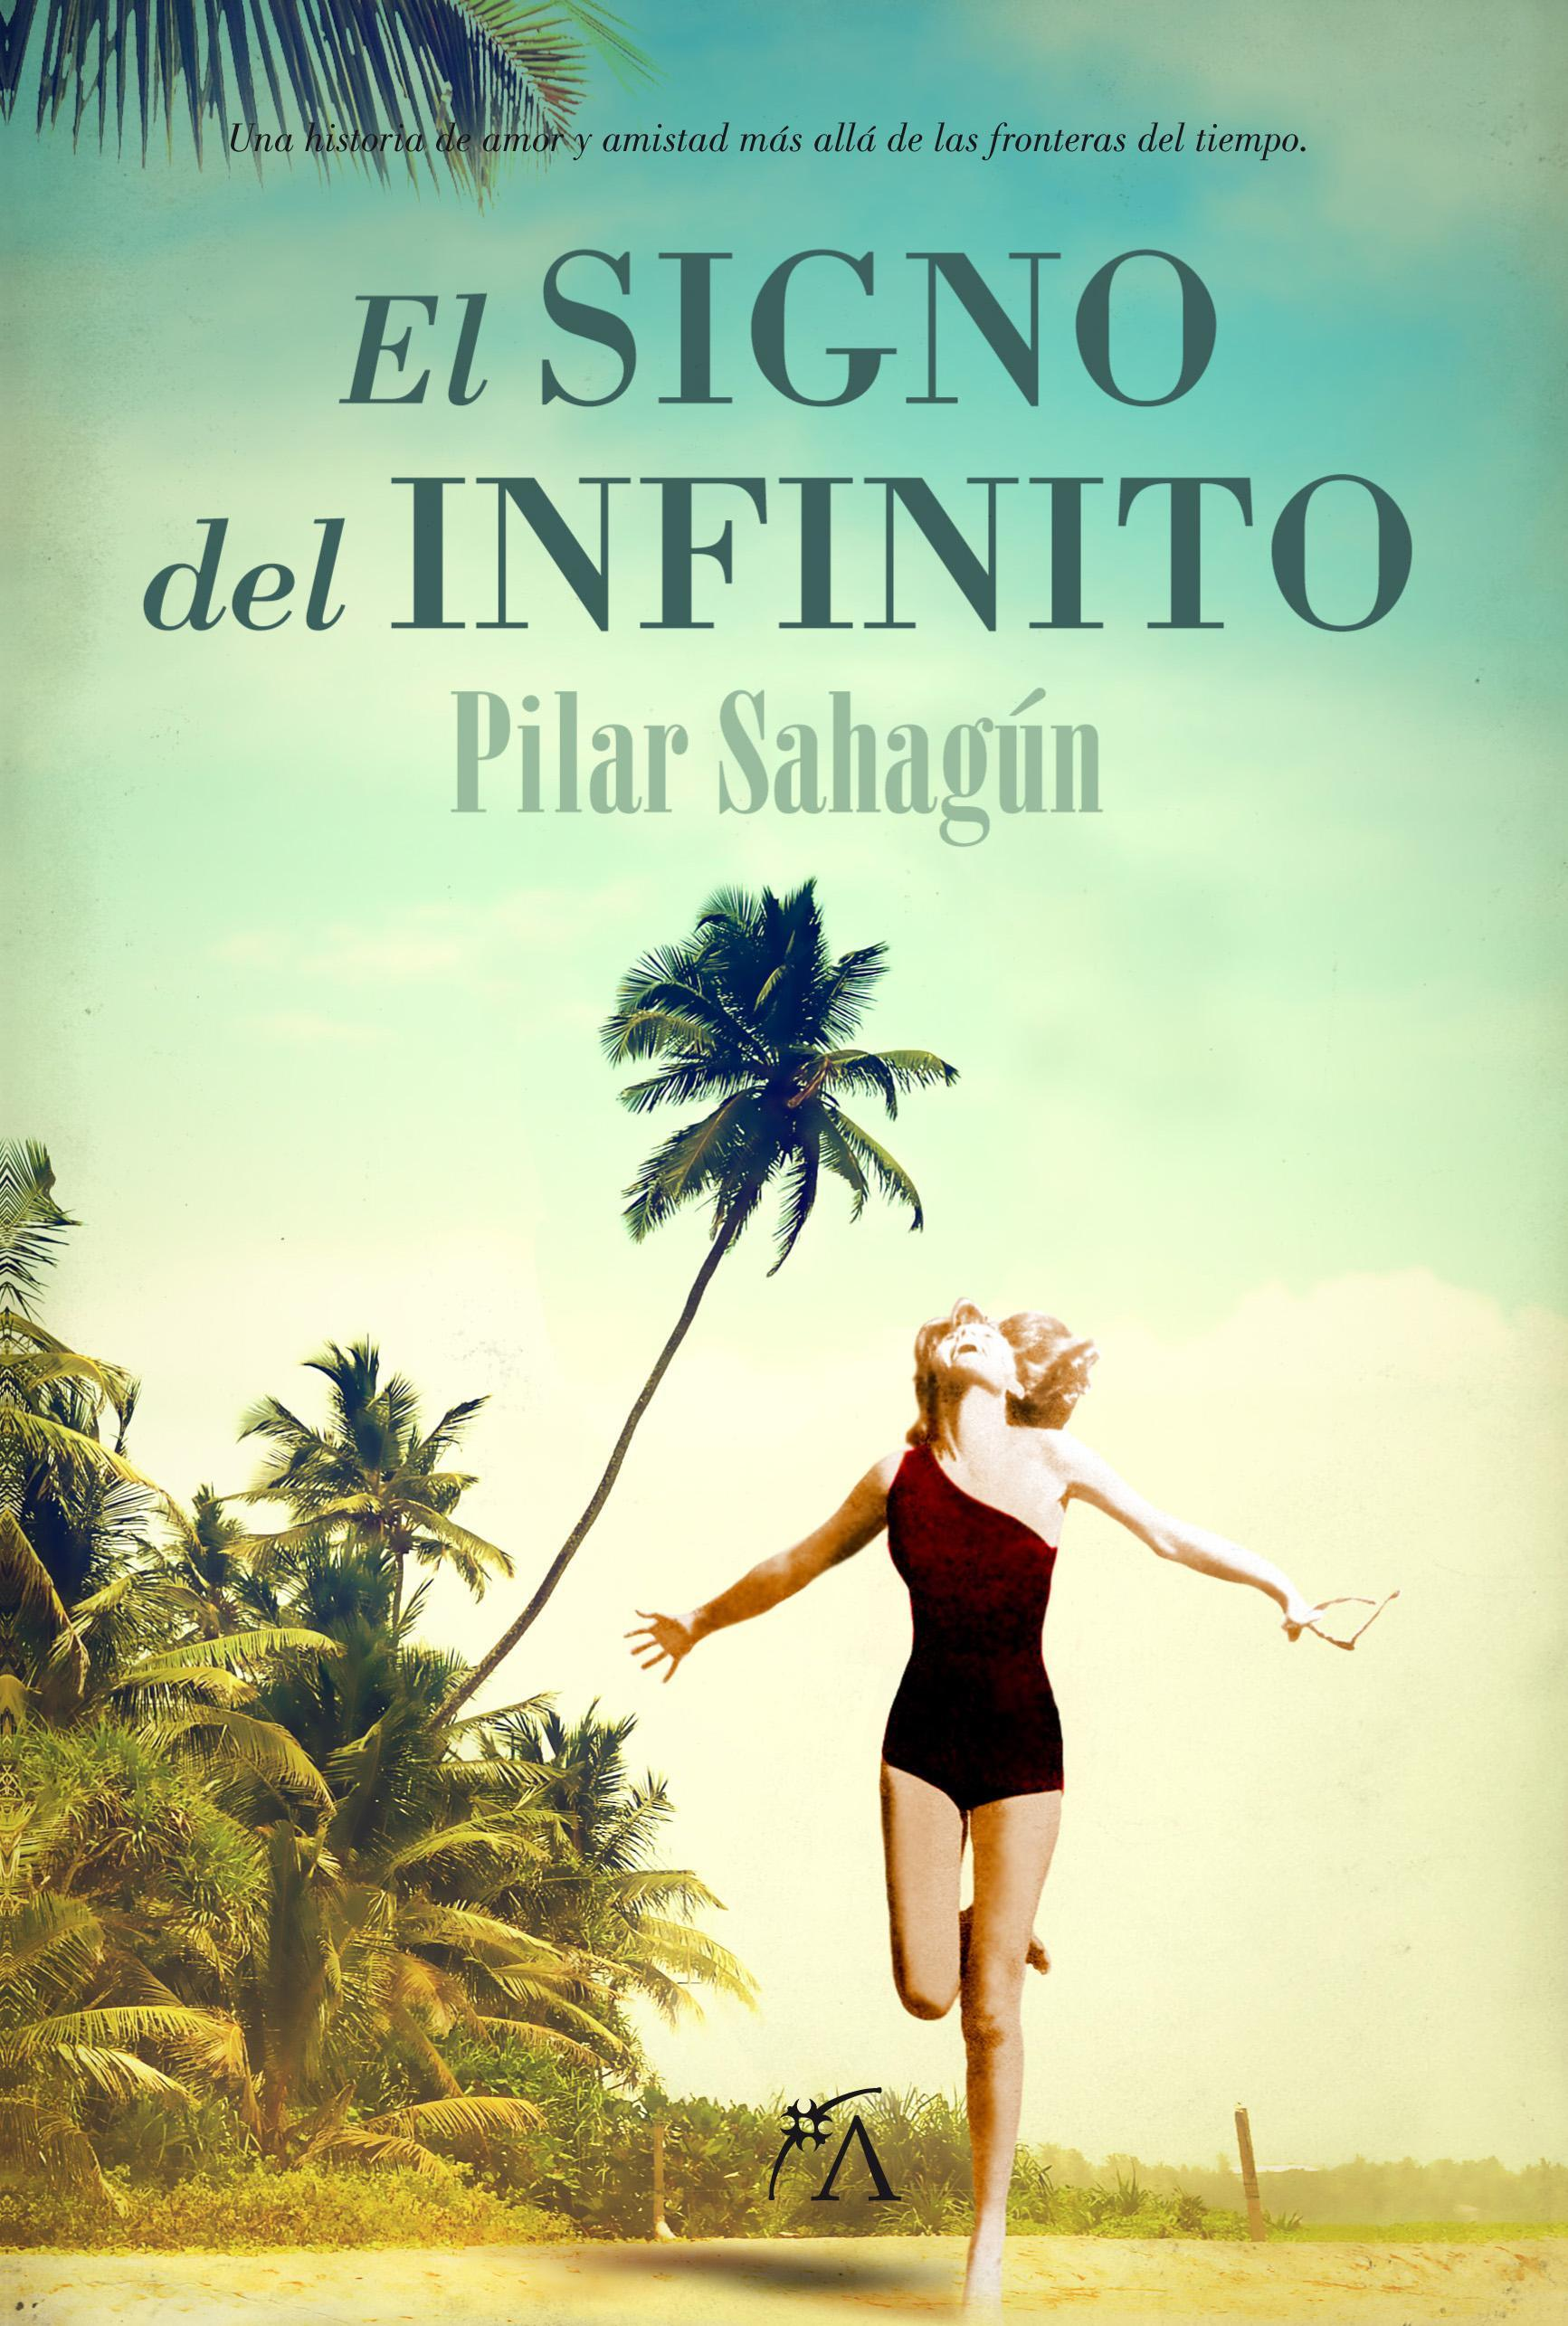 El signo del infinito  by  Pilar Sahagún González